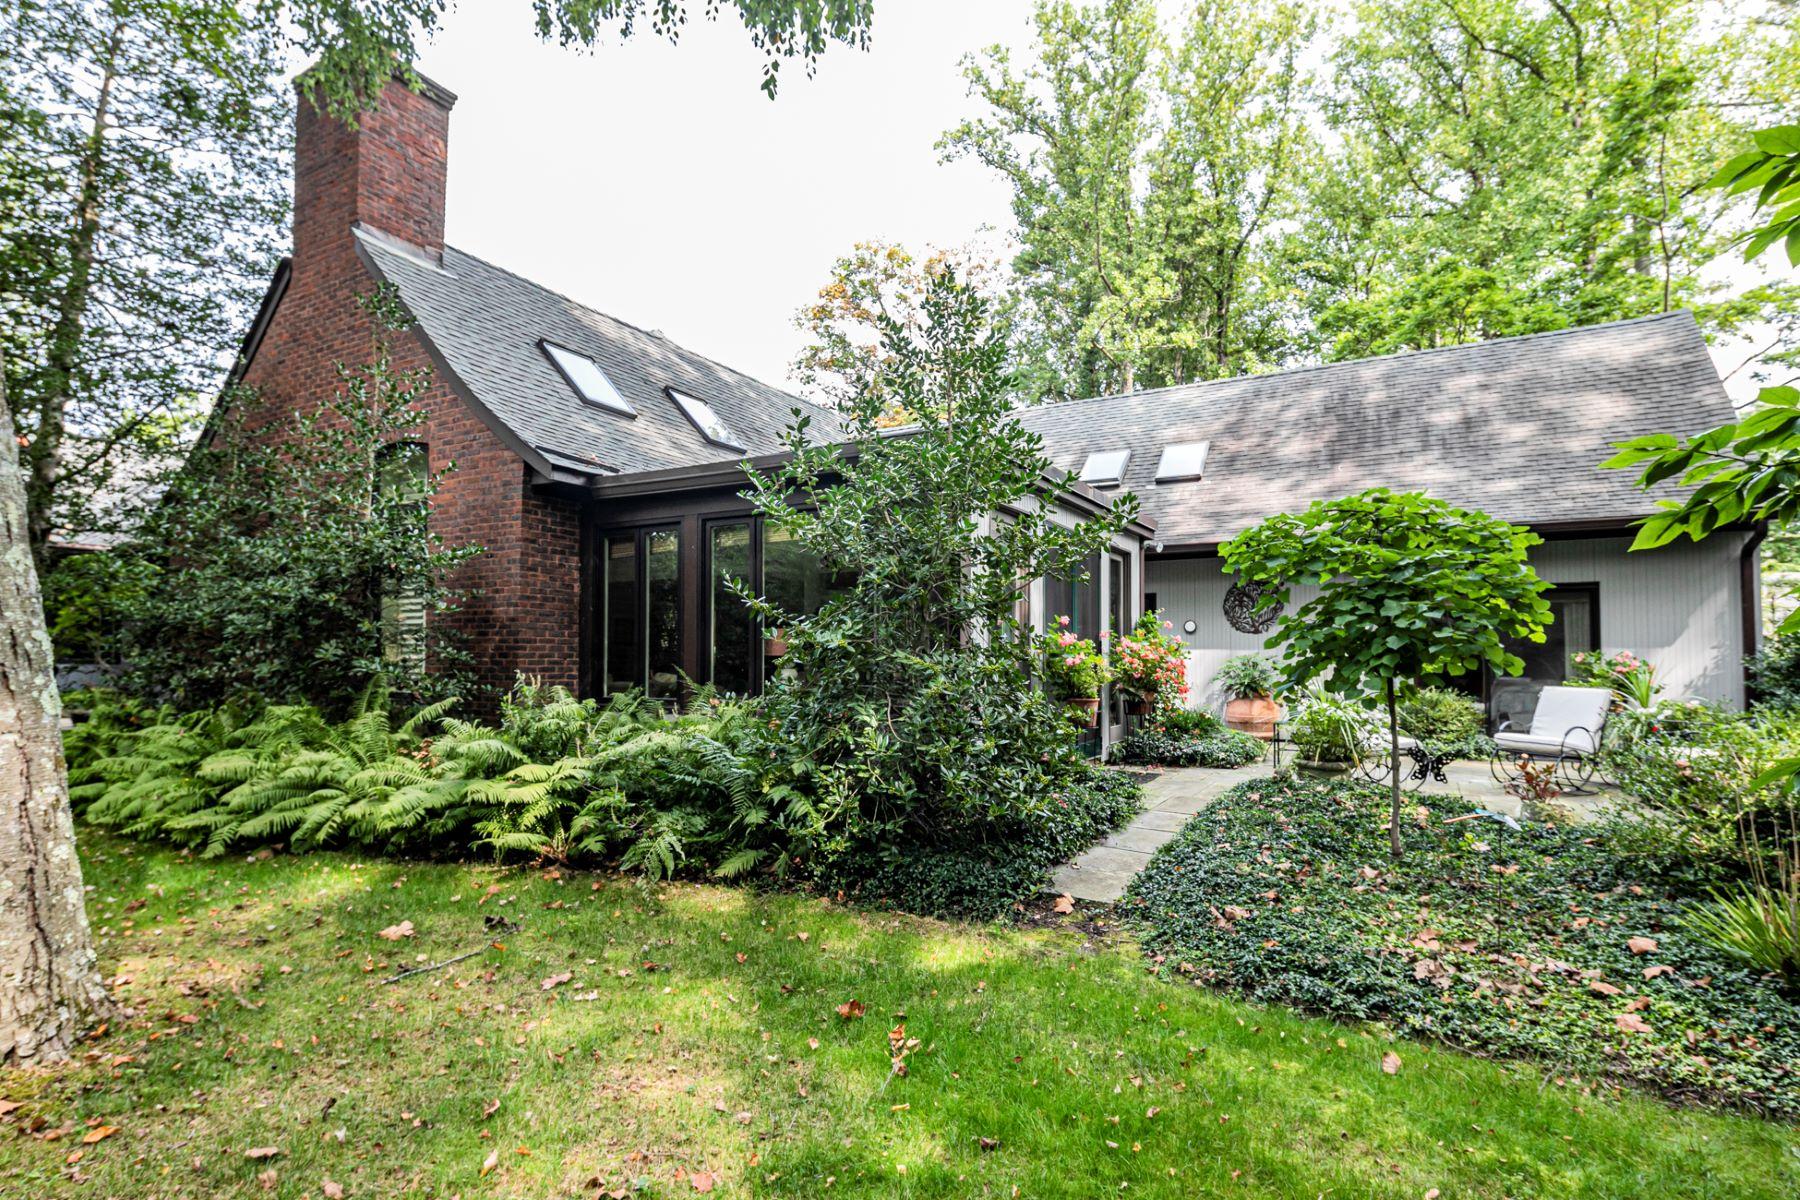 townhouses için Satış at Carefree Elegance at Its Most Convenient 27 Constitution Hill West, Princeton, New Jersey 08540 Amerika Birleşik Devletleri